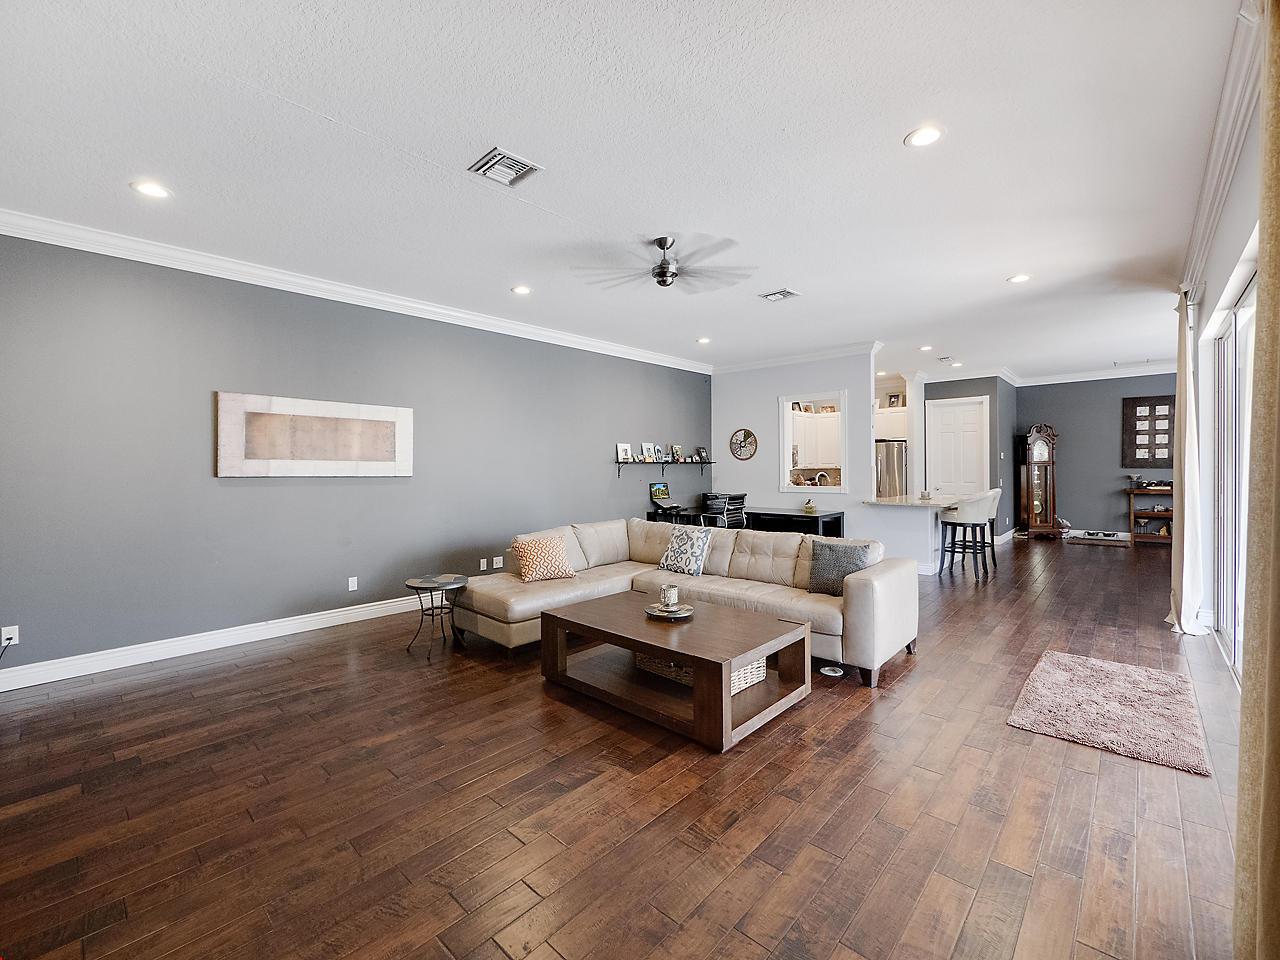 3406 Greenway Drive, Jupiter, Florida 33458, 3 Bedrooms Bedrooms, ,3 BathroomsBathrooms,A,Single family,Greenway,RX-10452539